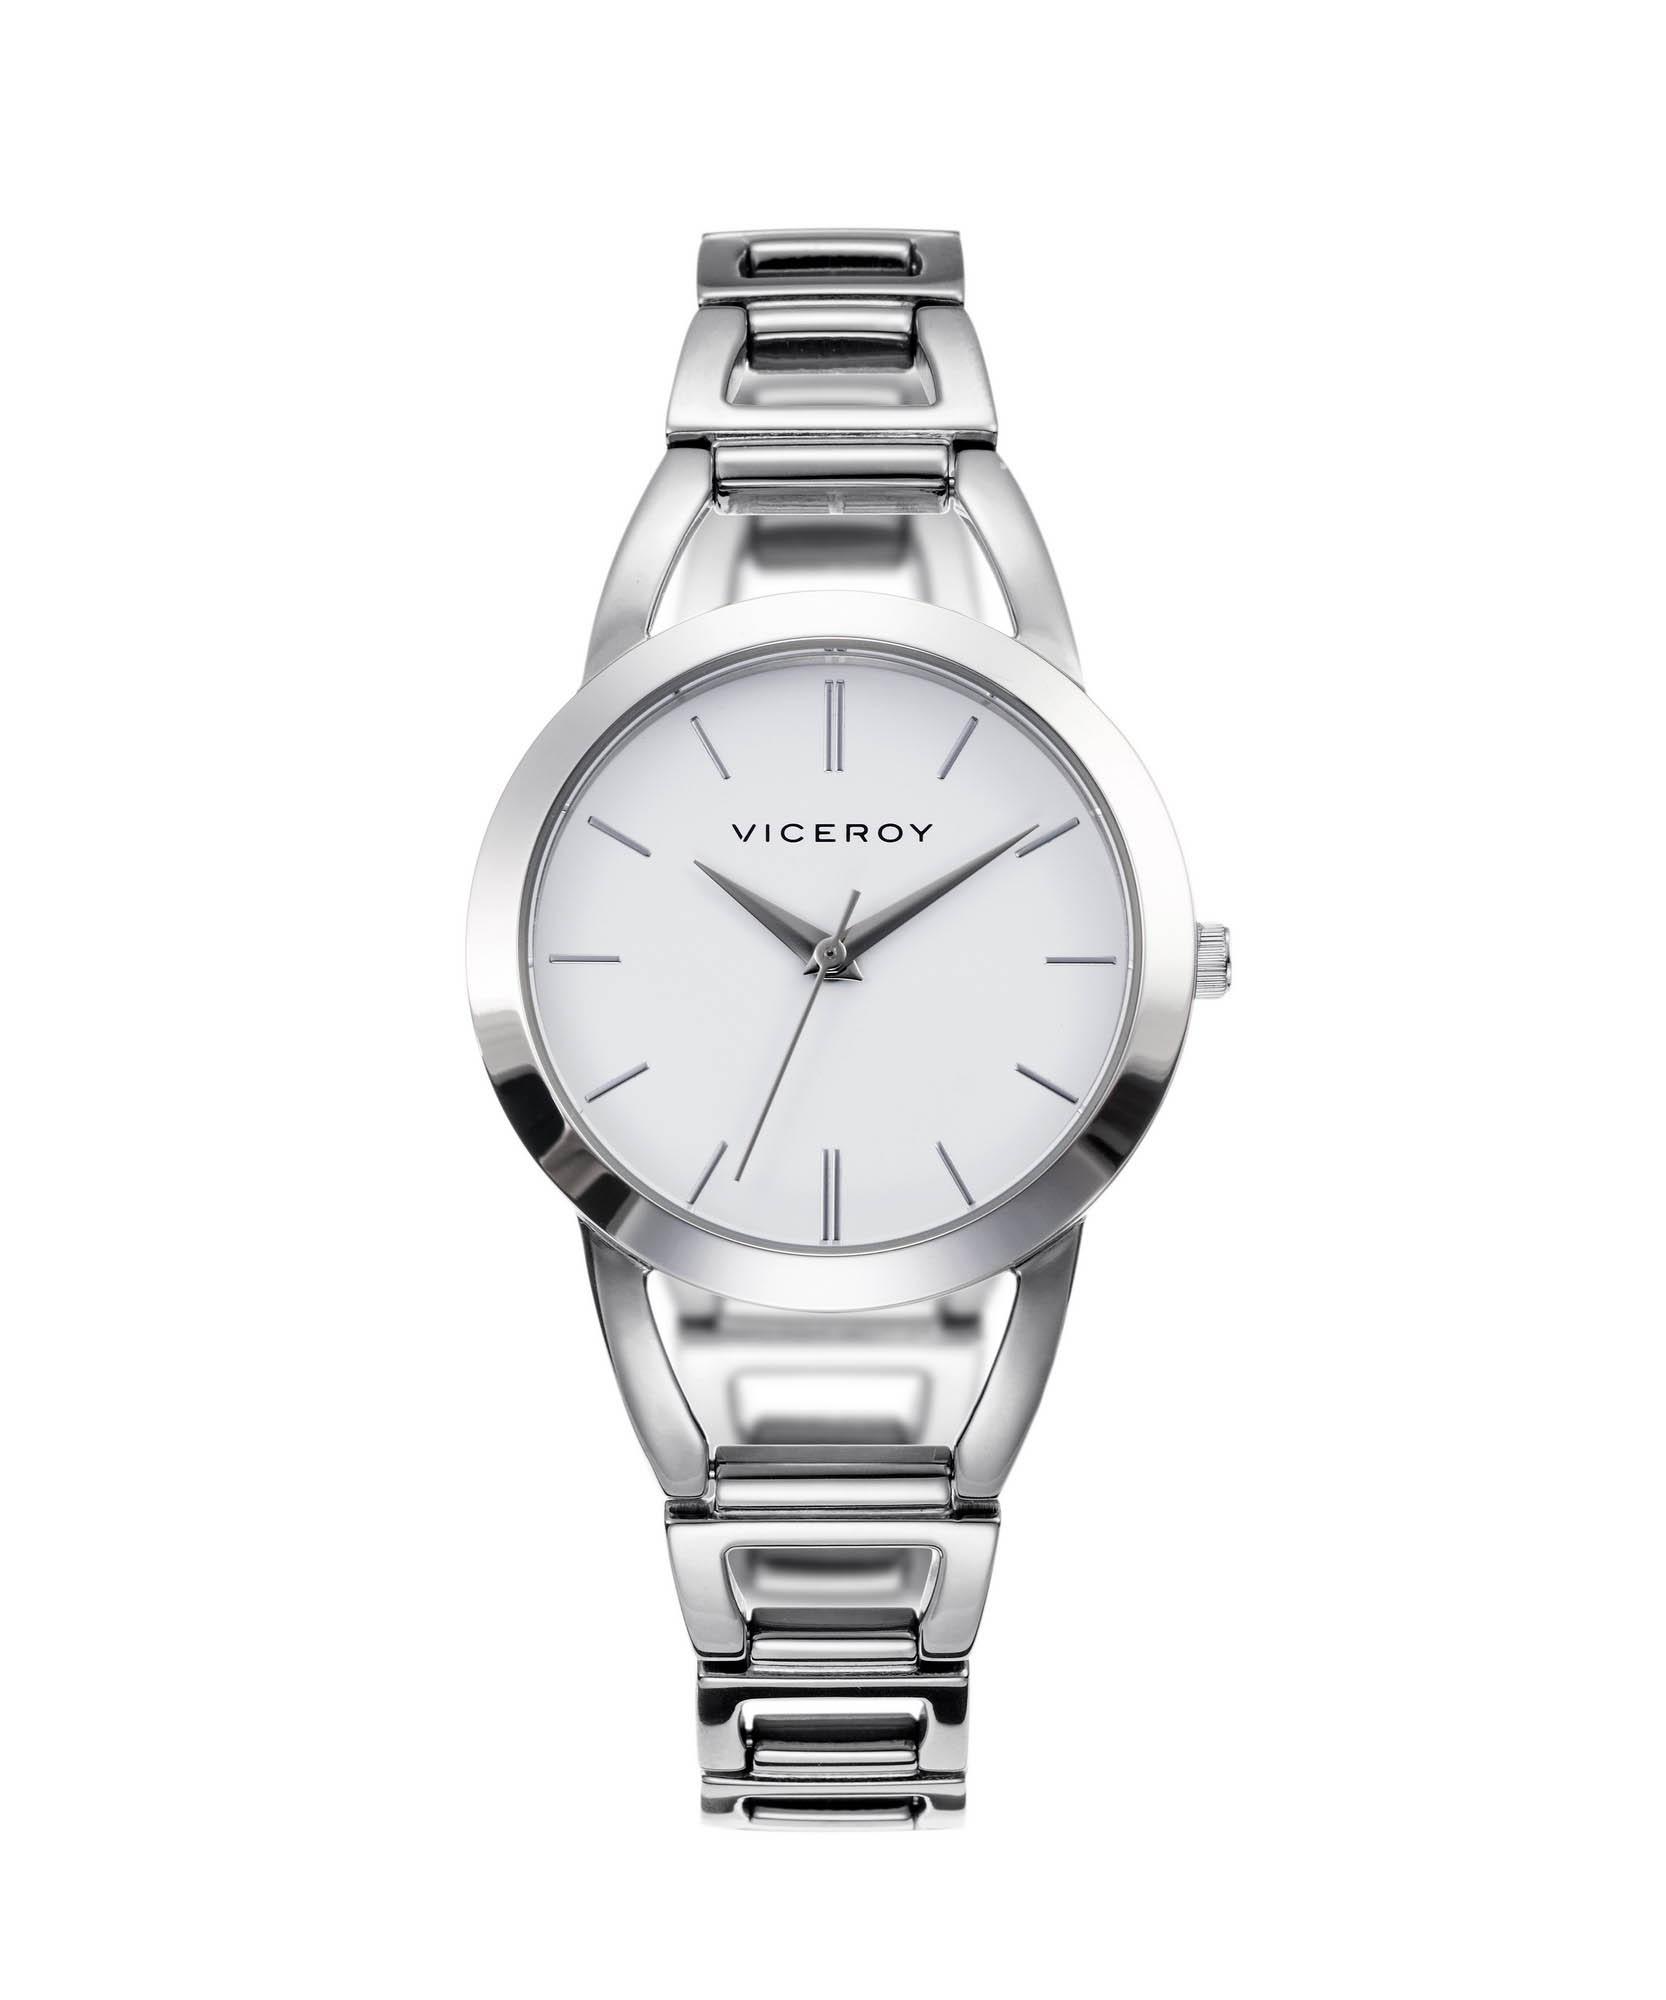 Harga Jual Adidas Adh3014 Unisex Jam Tangan Termurah 2018 Adh2912 Hitam Relojes Viceroy Reloj Mujer 40820 07 Price And Stock